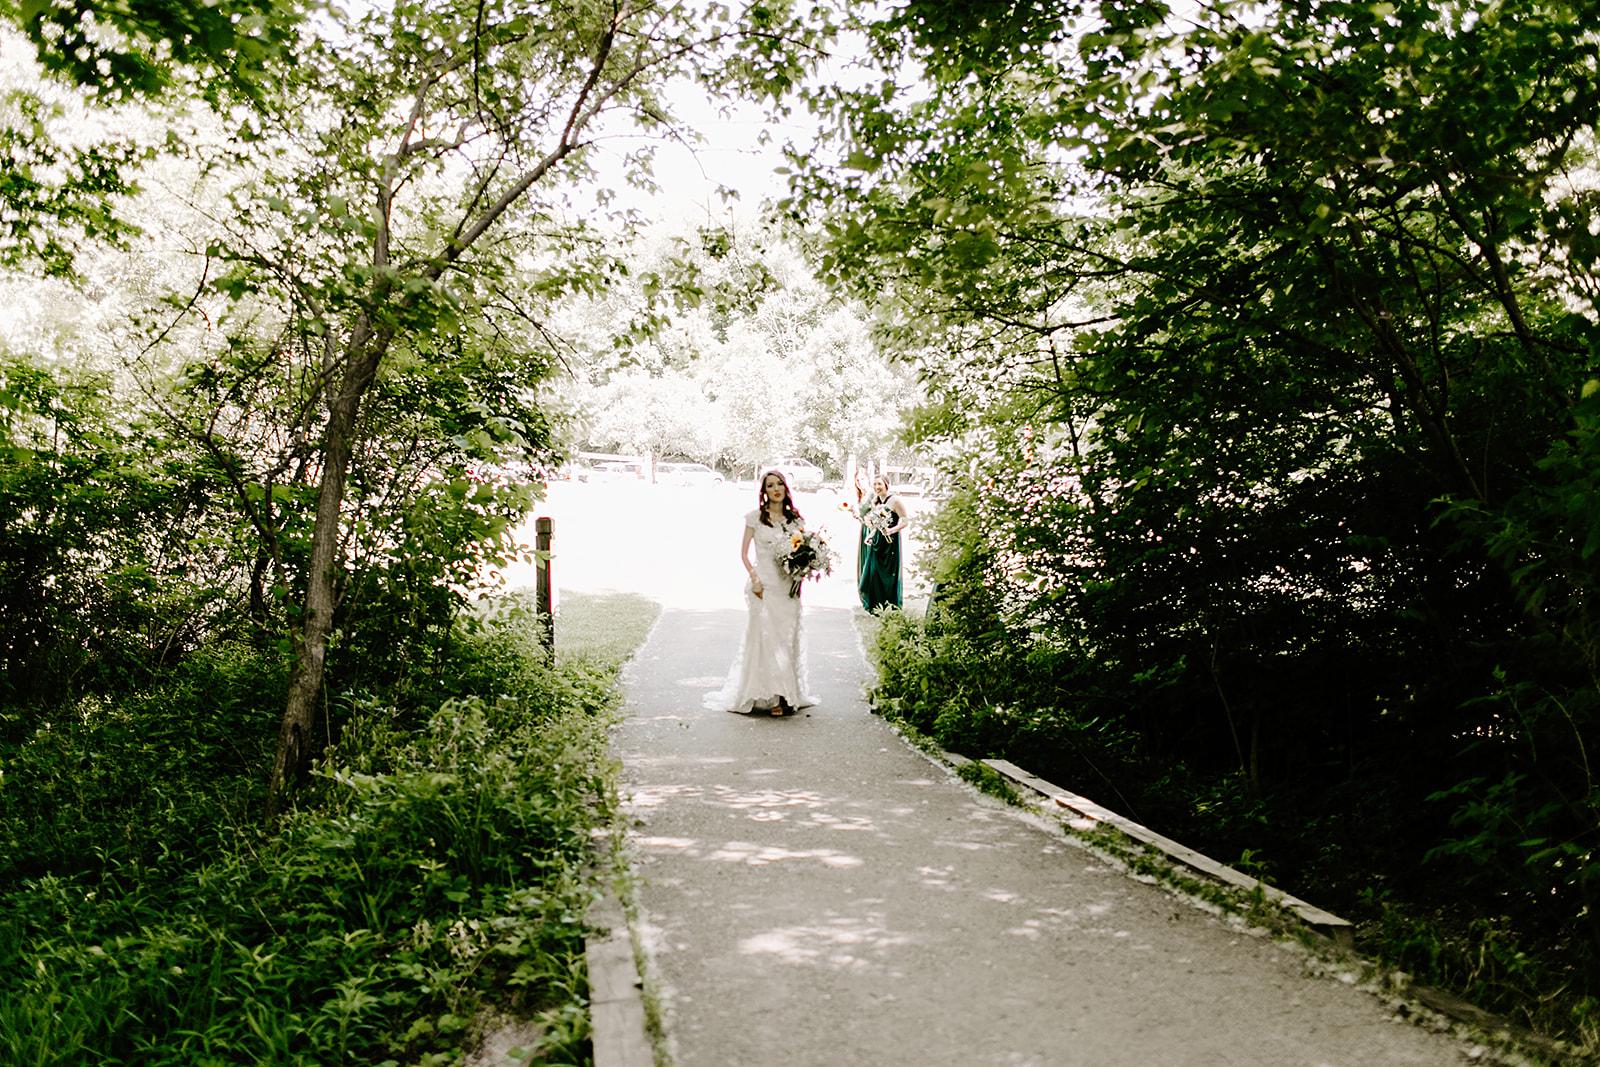 Lily and Easton Wedding Carmel Indiana Cool Creek Park Grace Church Emily Elyse Wehner Photography -75.jpg